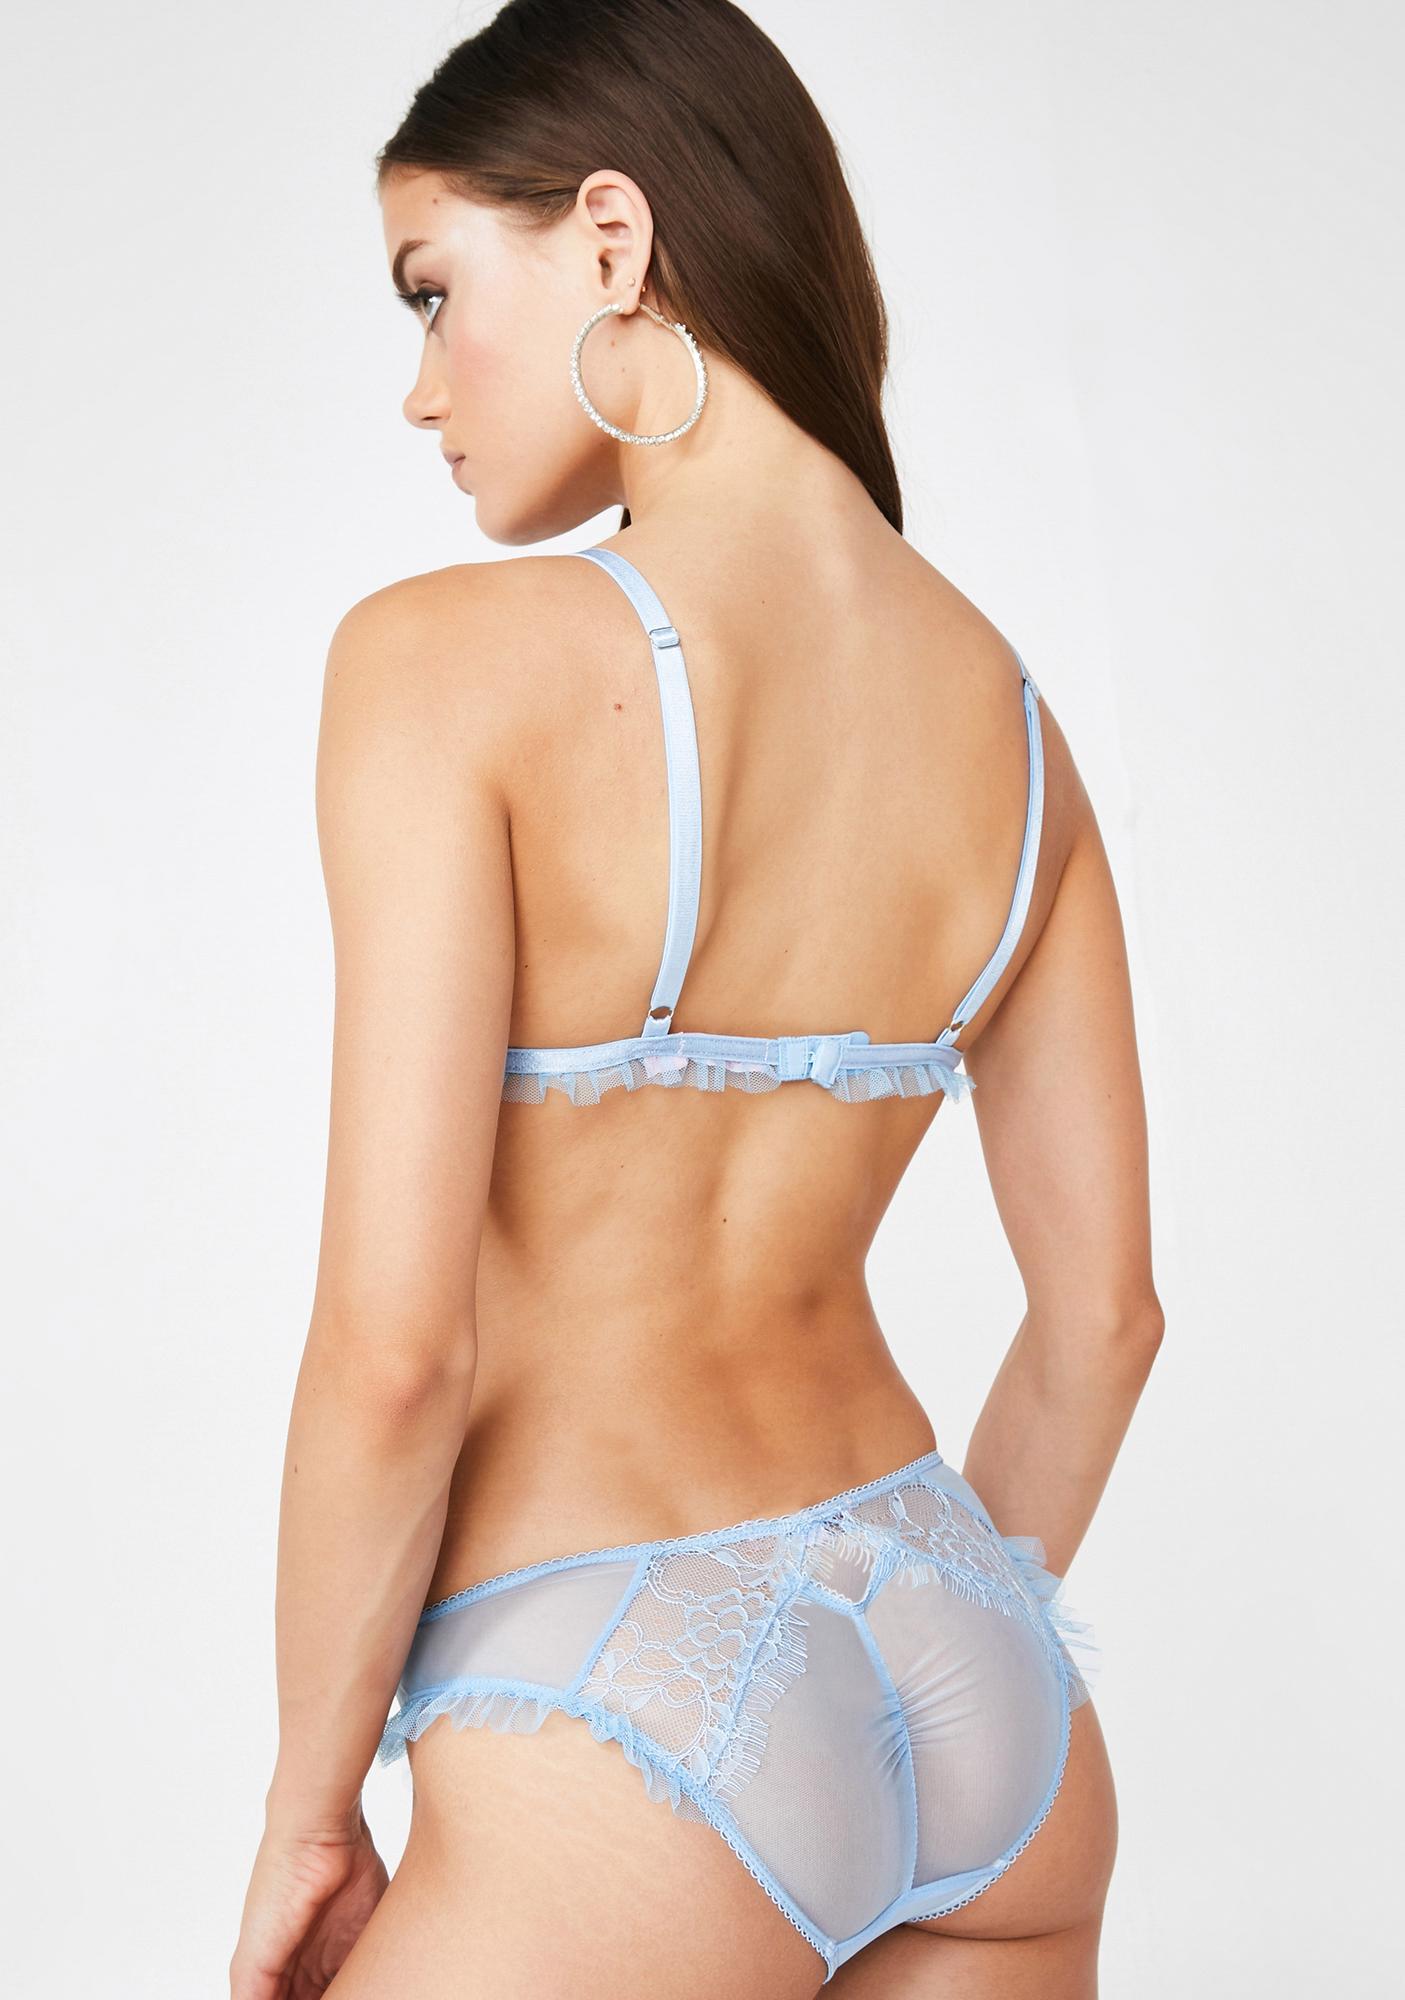 Sugar Thrillz Madame Frou Frou Ruffled Panty